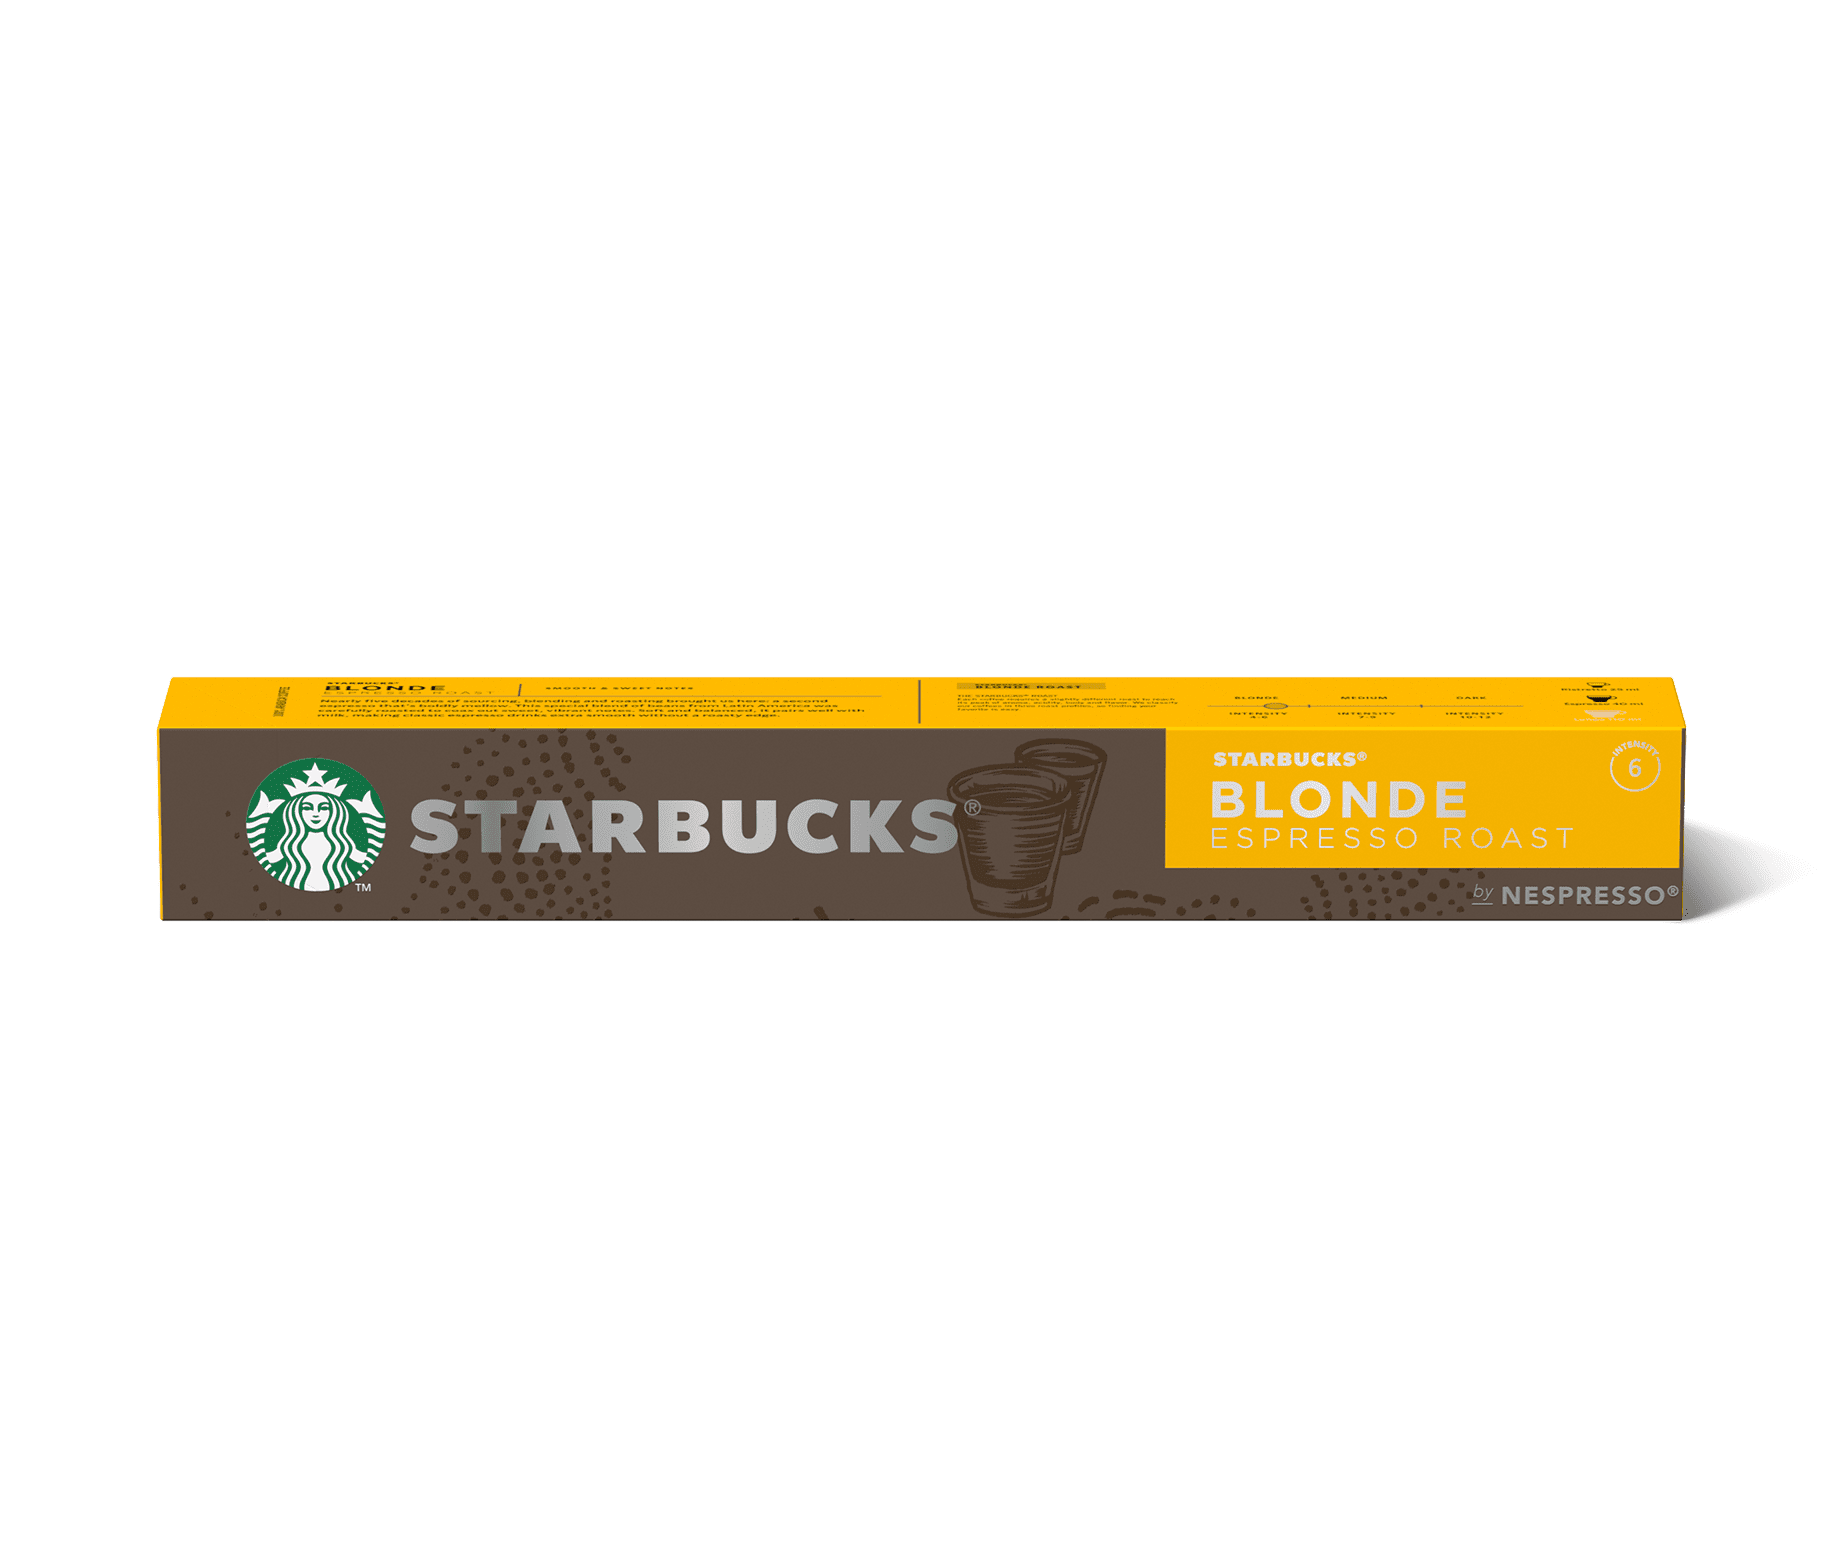 STARBUCKS® BLONDE Espresso Roast by NESPRESSO® Coffee